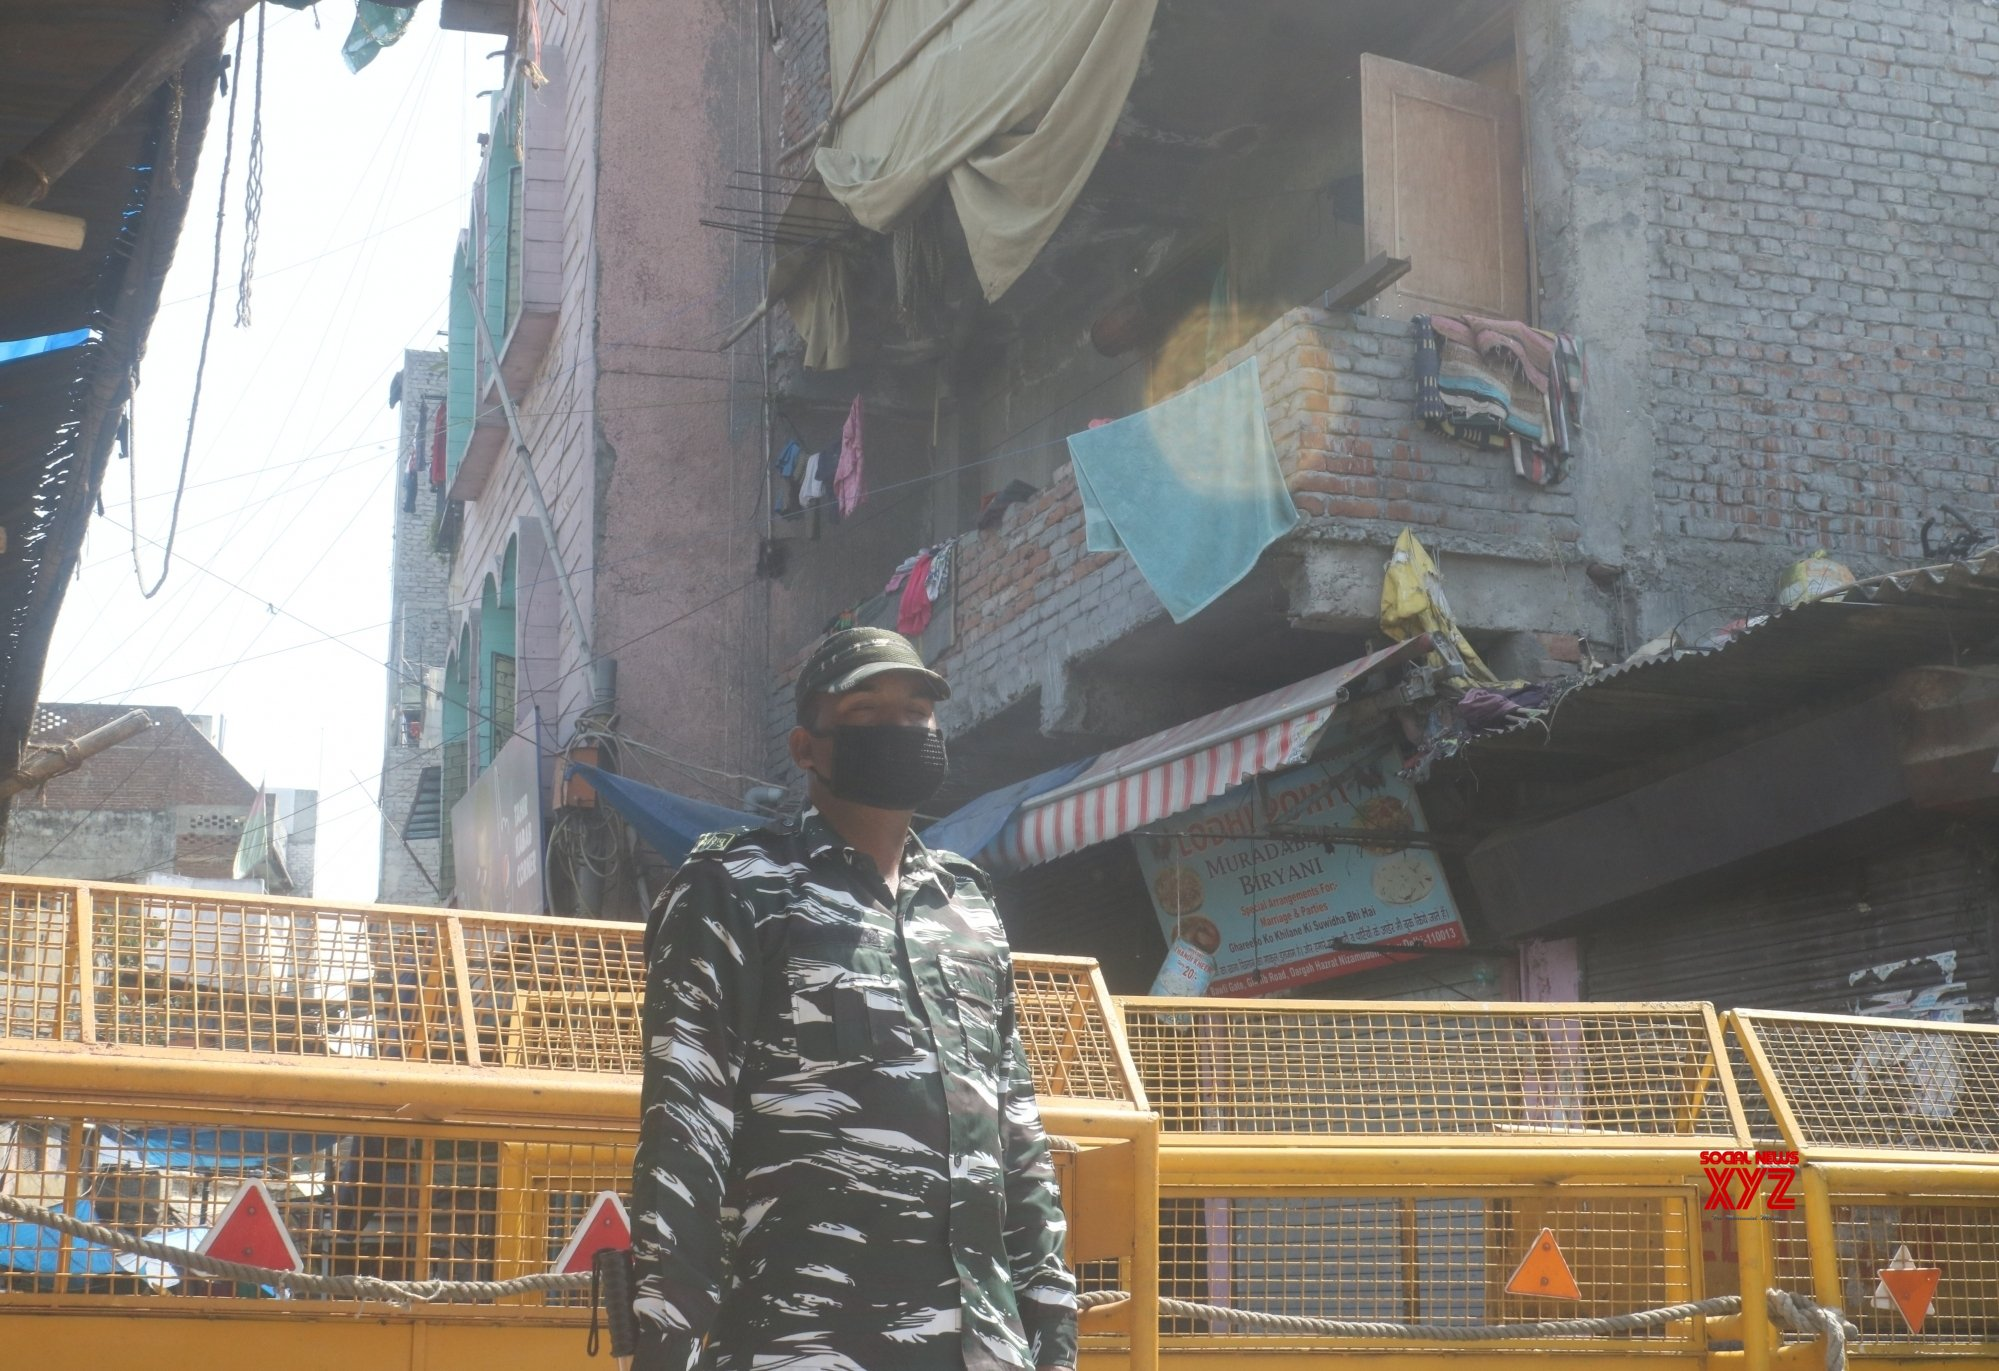 Sogal Traitement De Surface new delhi: nizamuddin west sealed during lockdown #gallery